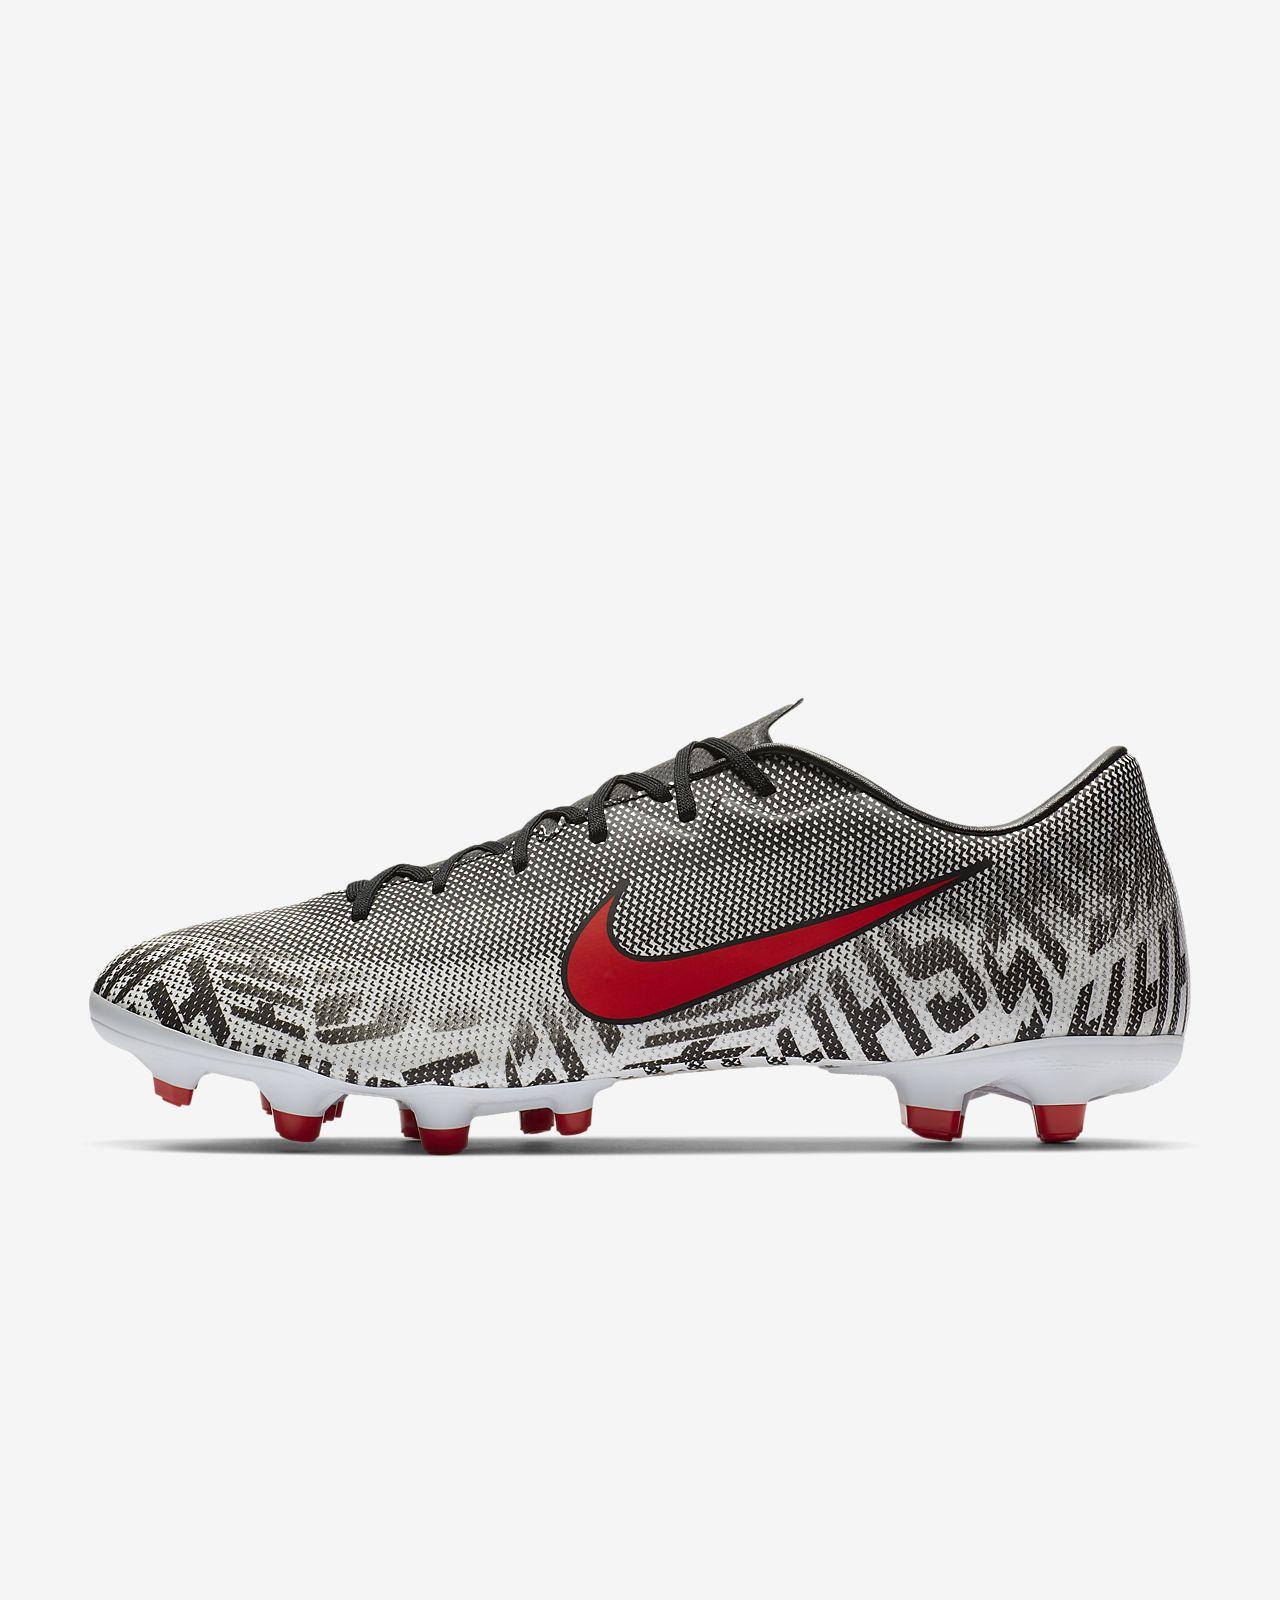 Nike Mercurial Vapor XII Academy Neymar Multi-Ground Football Boot